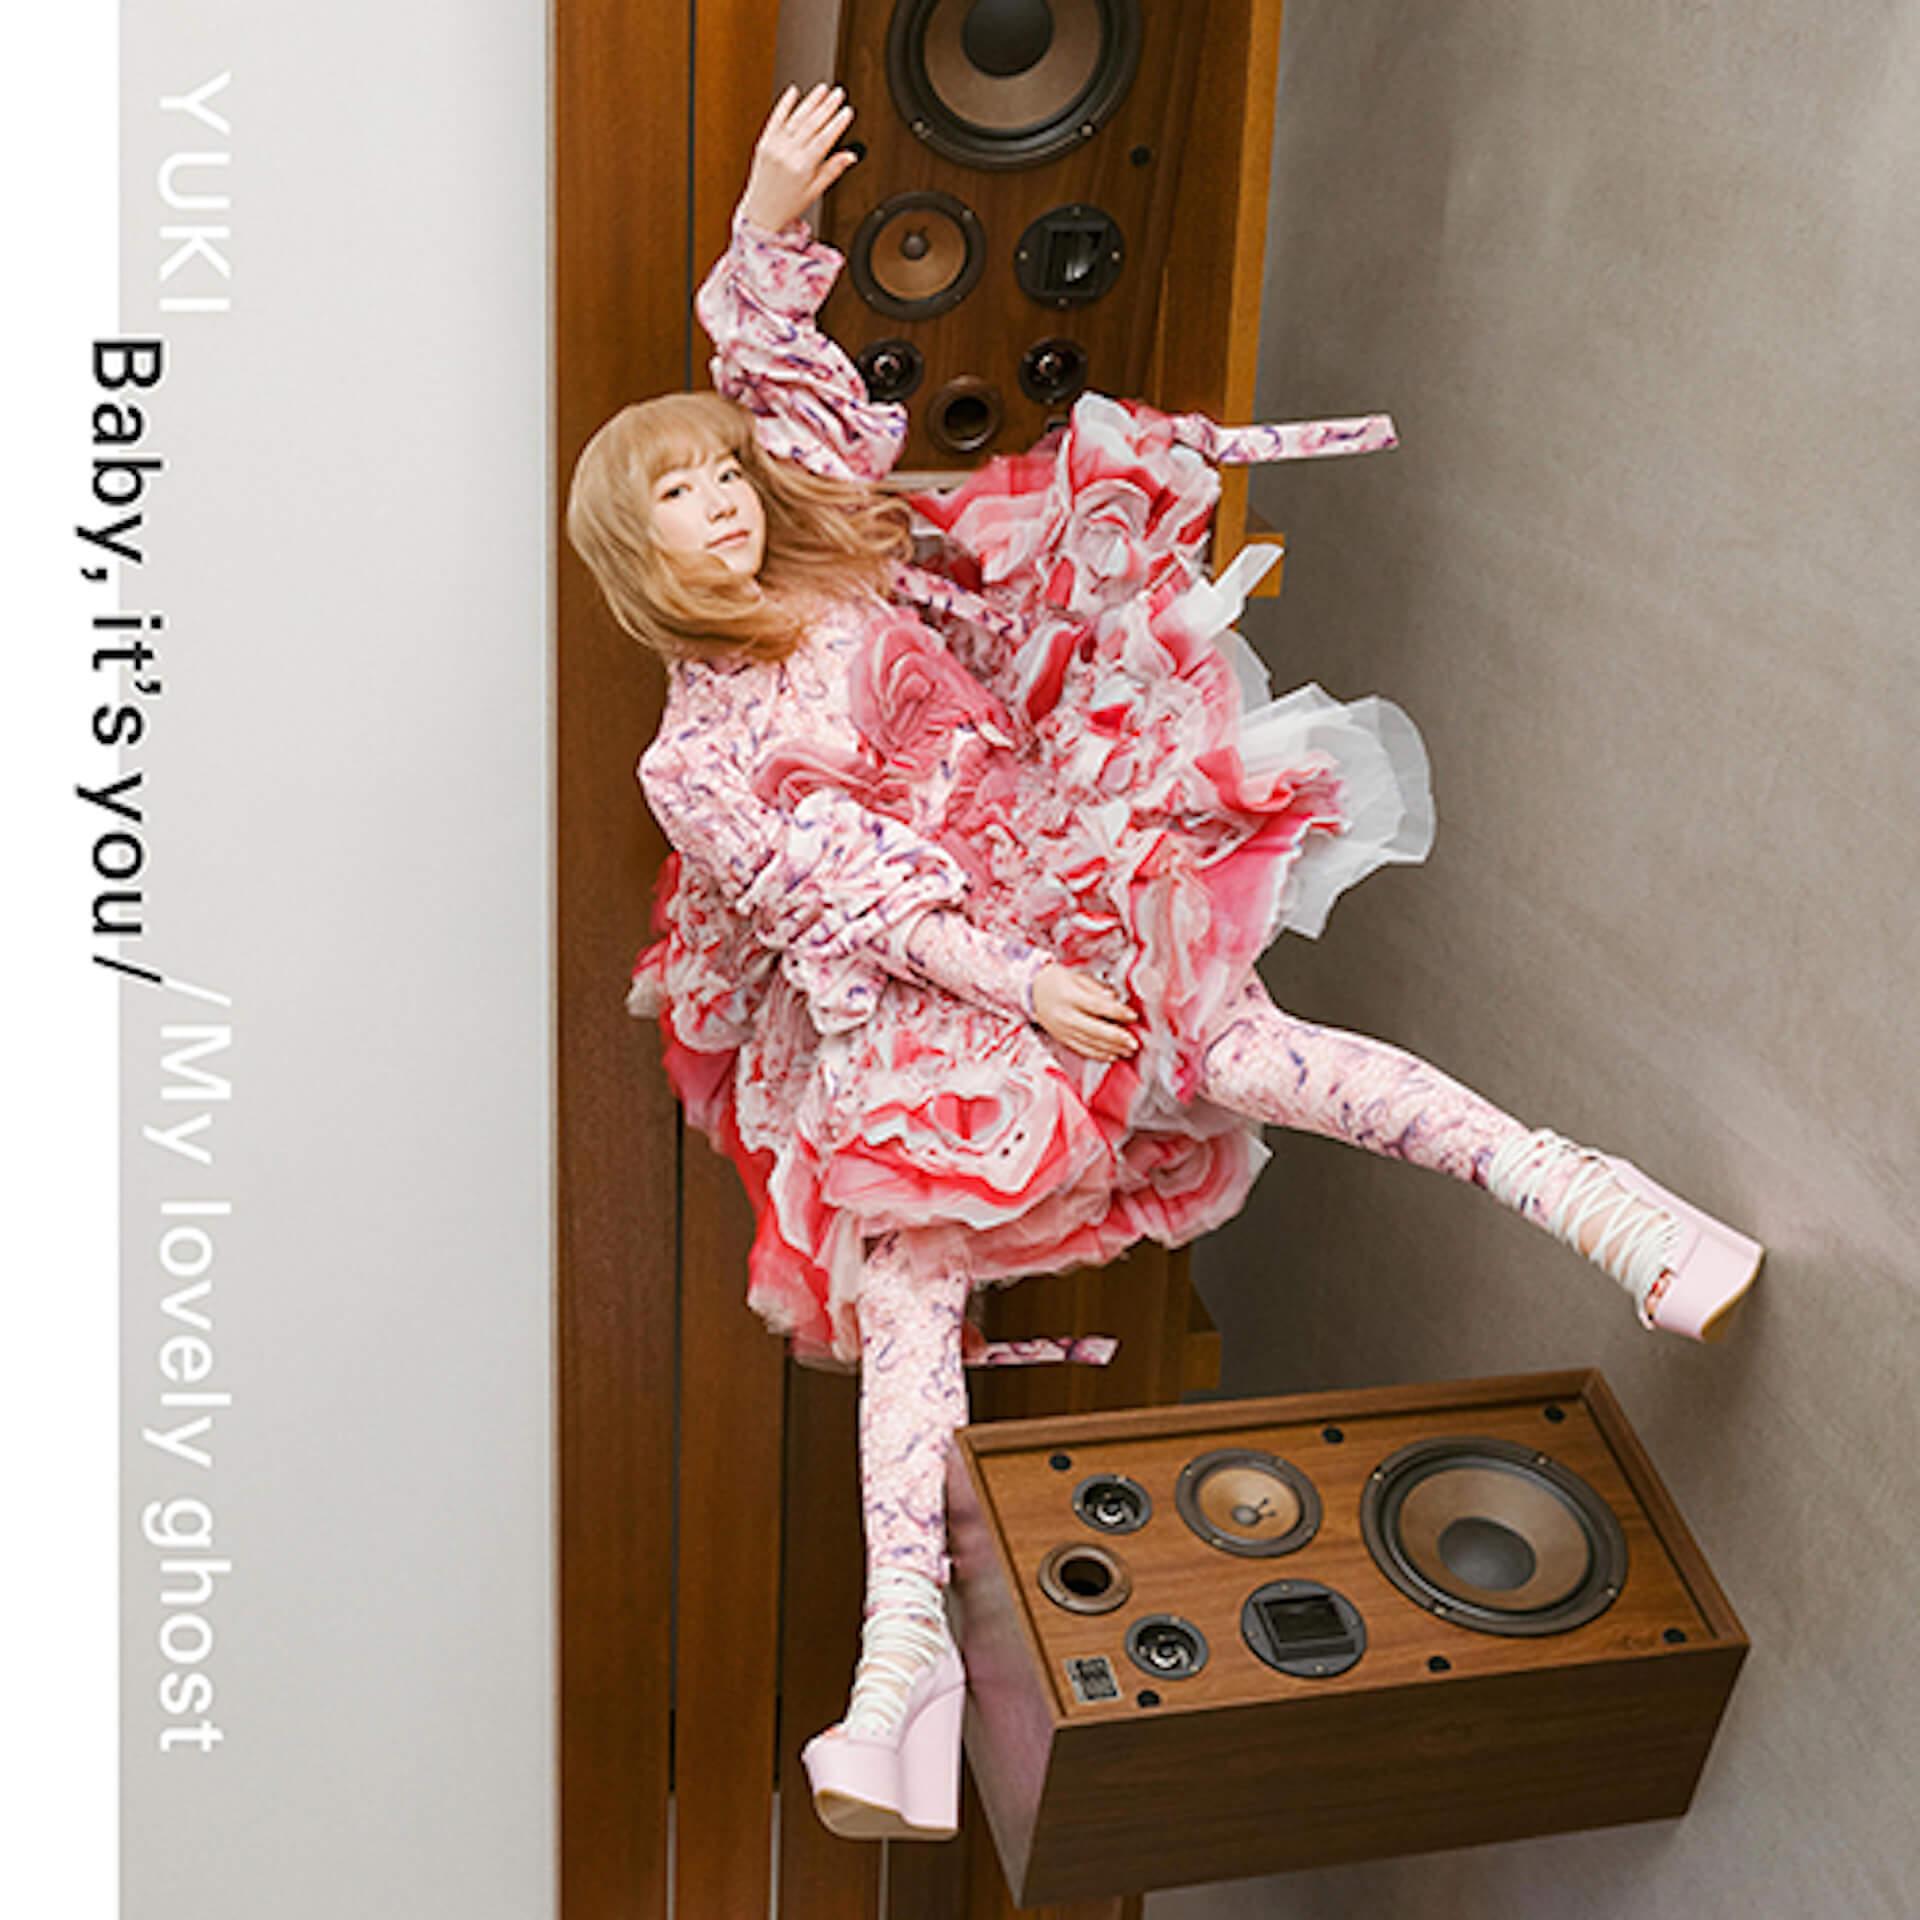 "YUKIのニューアルバム『Terminal』収録""My lovely ghost""のMVティザー映像が解禁!ラジオ出演も決定 music210415_yuki_2"